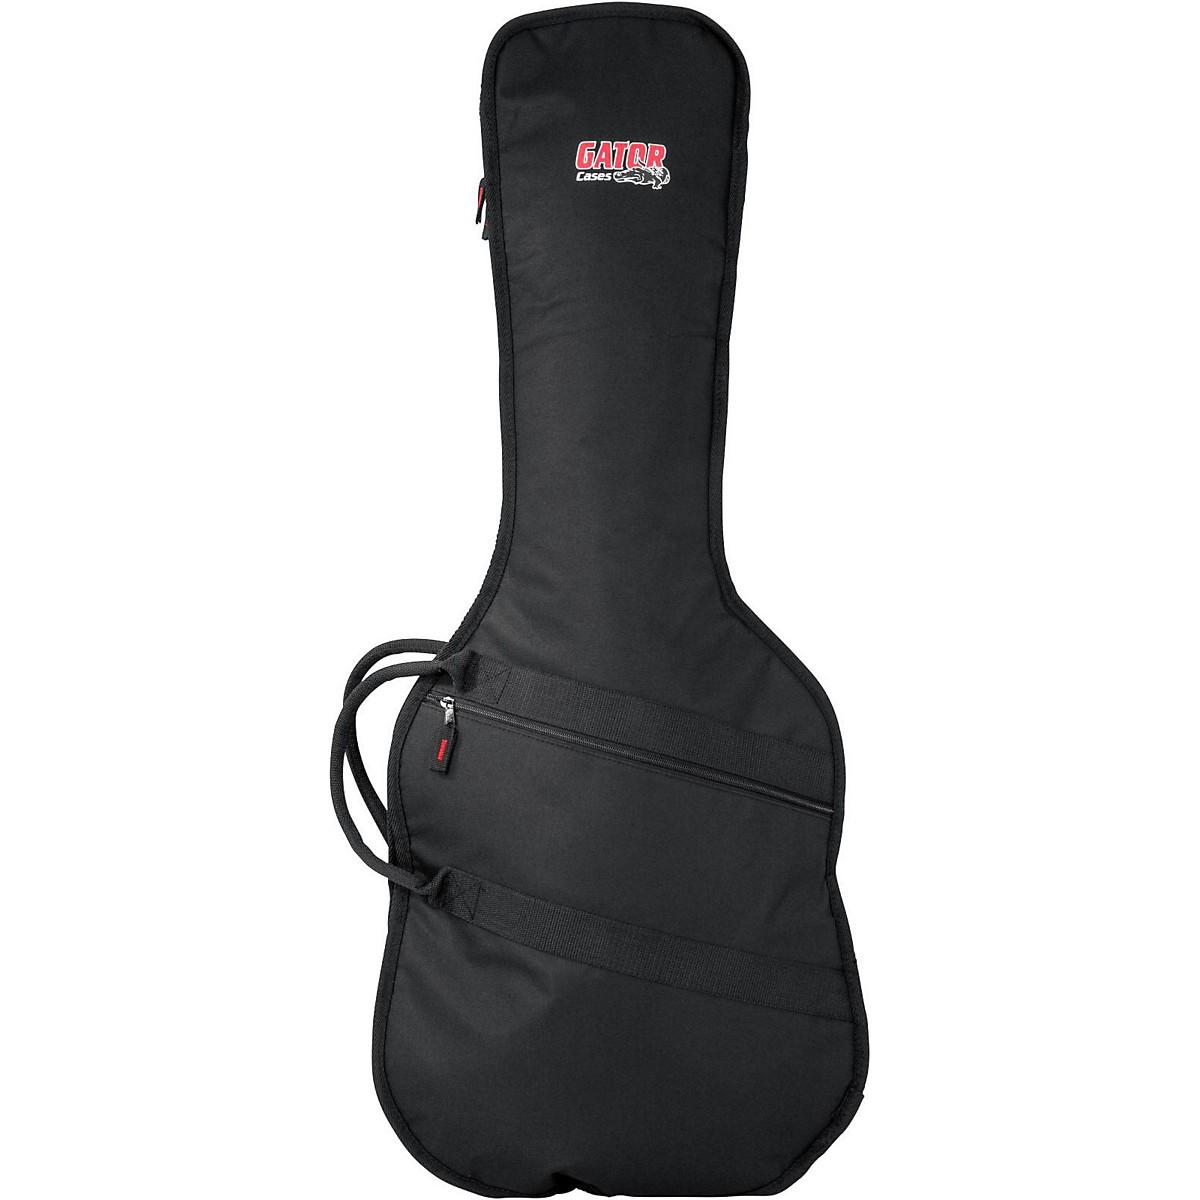 Gator GBE-Mini-Elec Gig Bag for 1/2 to 3/4 Size Electric Guitar